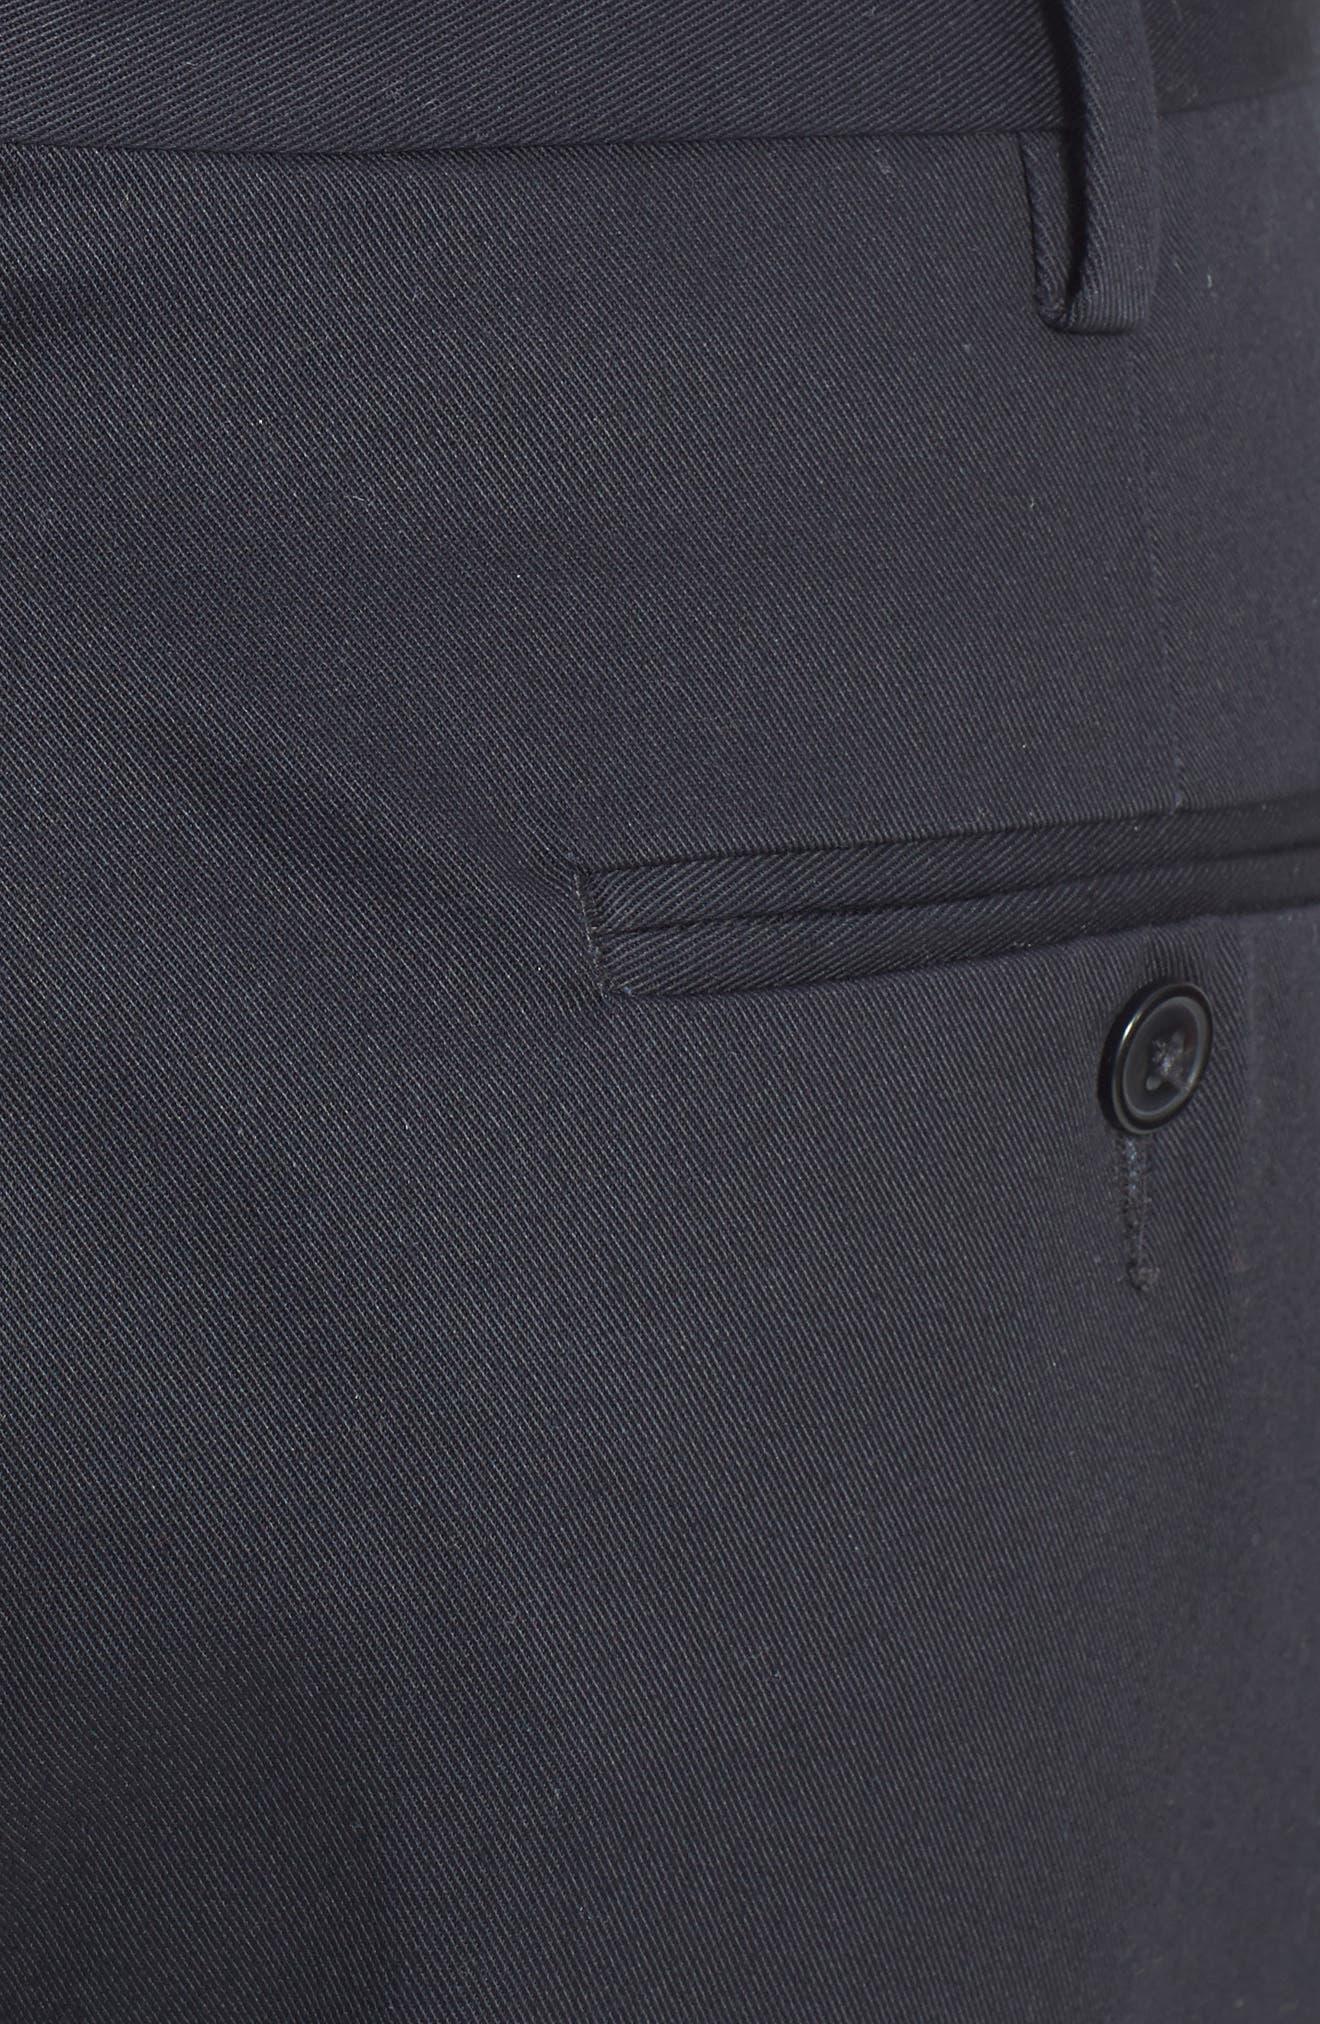 Pleated Cotton Trousers,                             Alternate thumbnail 4, color,                             BLACK